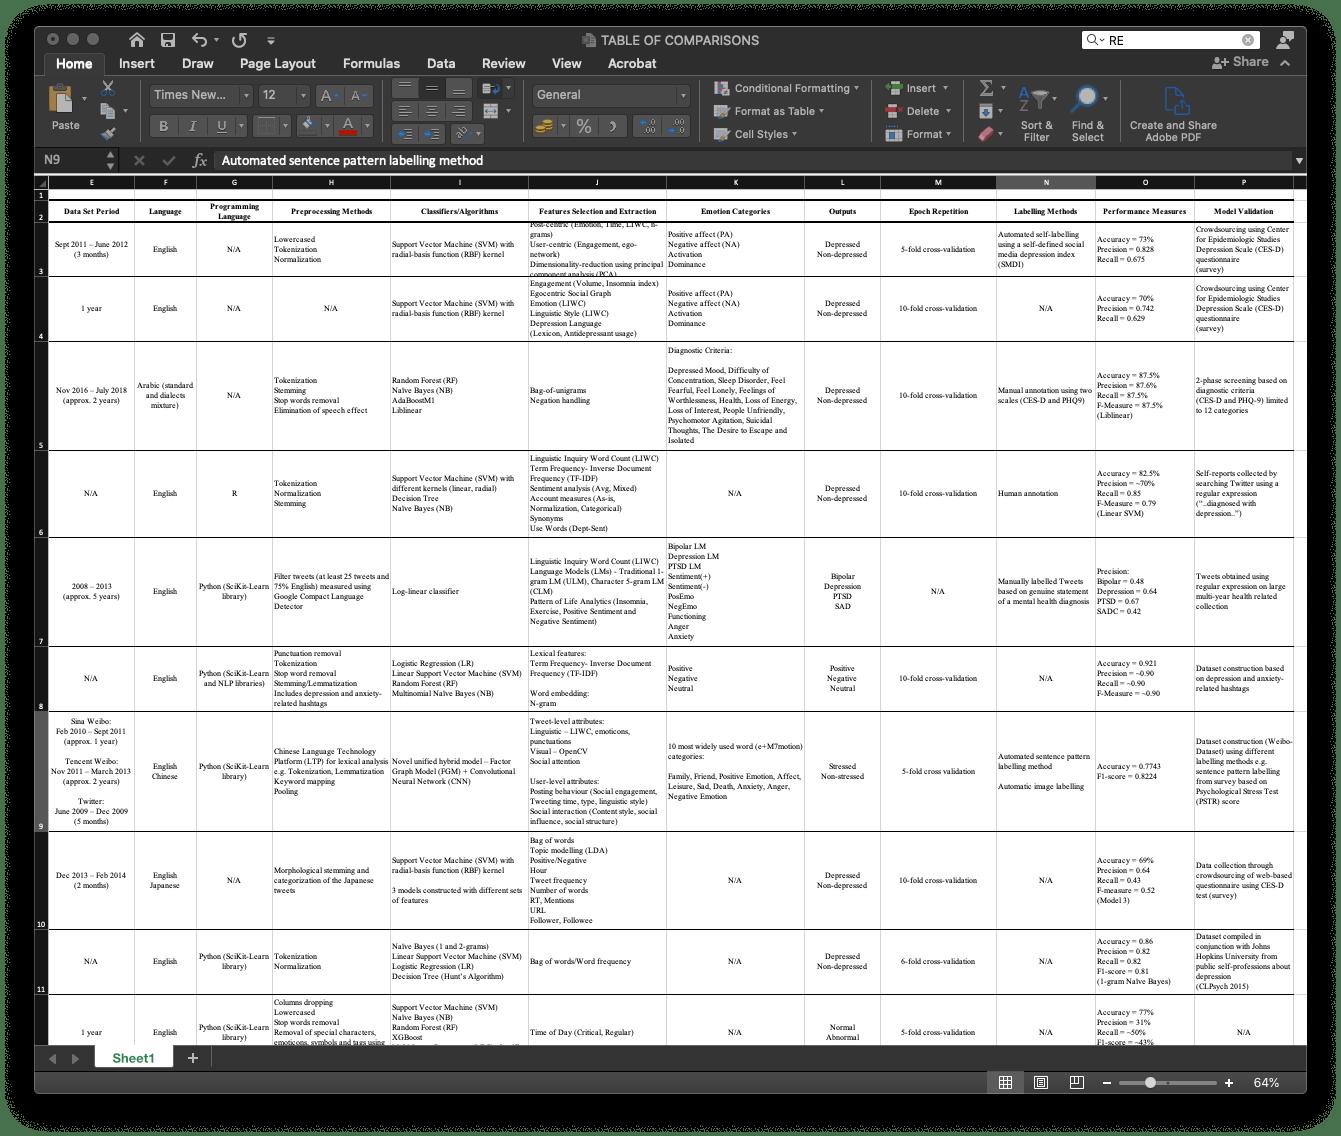 Screenshot 2021-04-04 at 8.09.16 PM.png